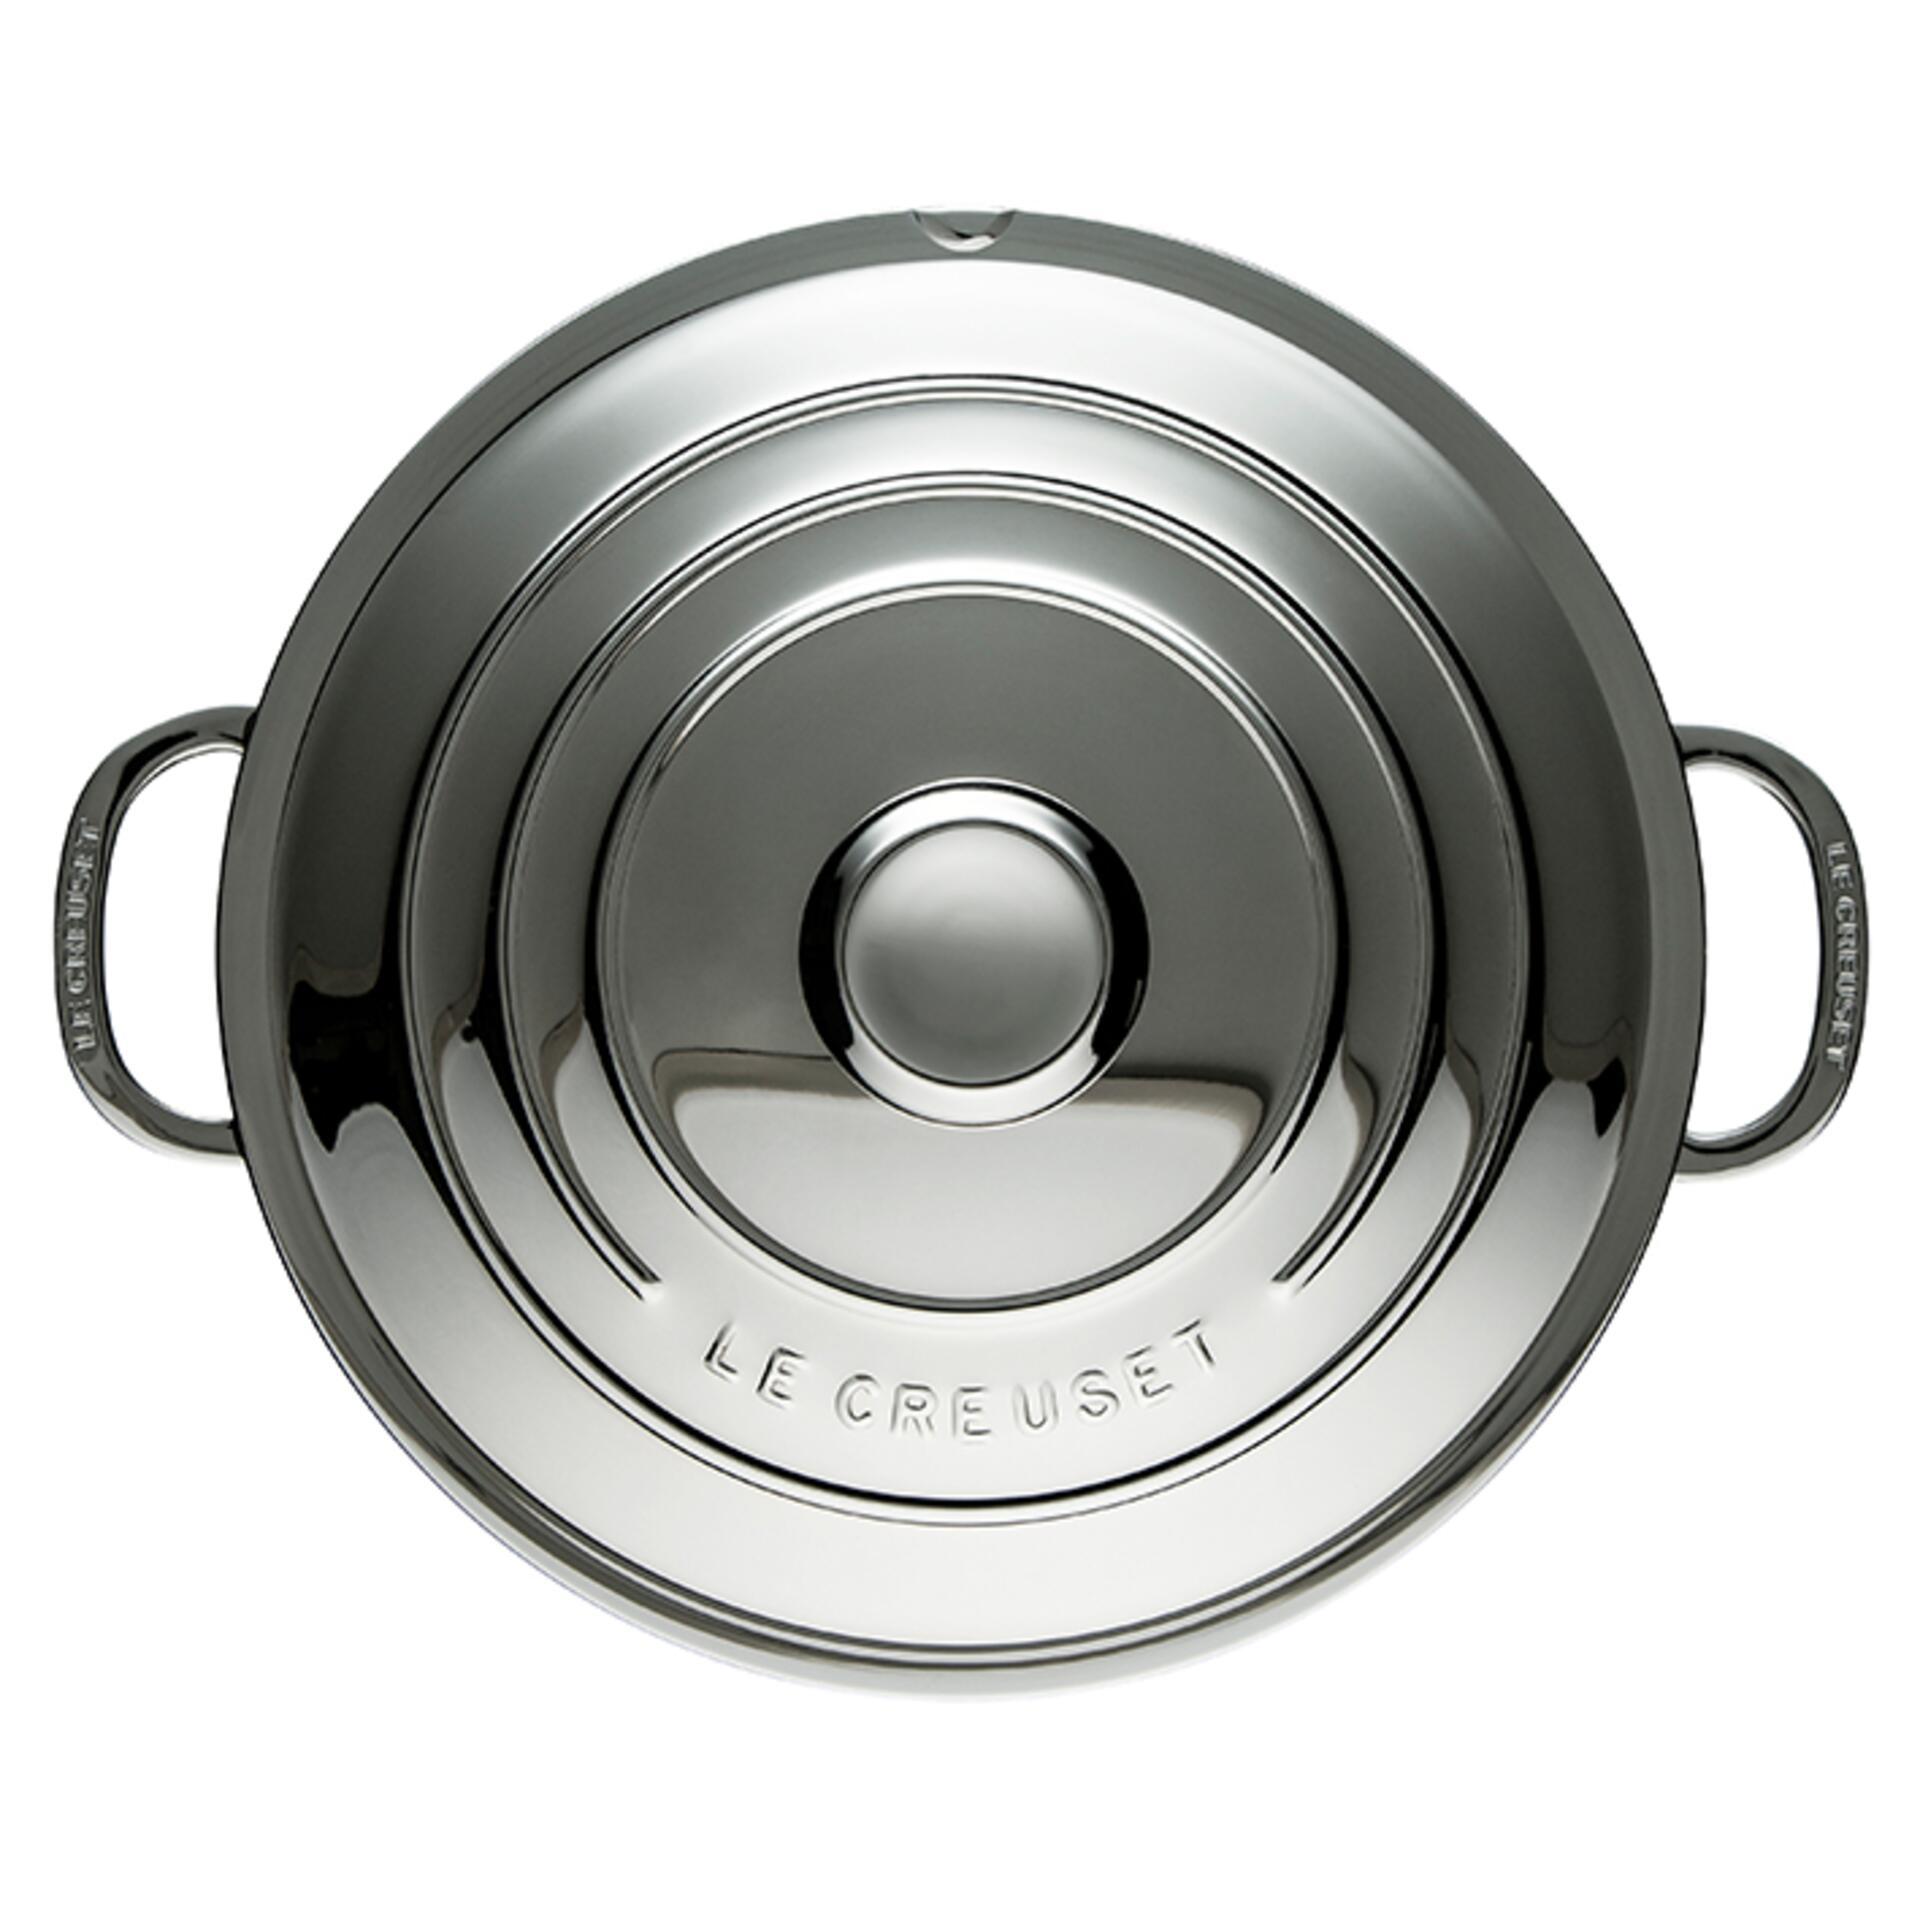 Le Creuset 3-ply PLUS Fleischtopf 18 cm